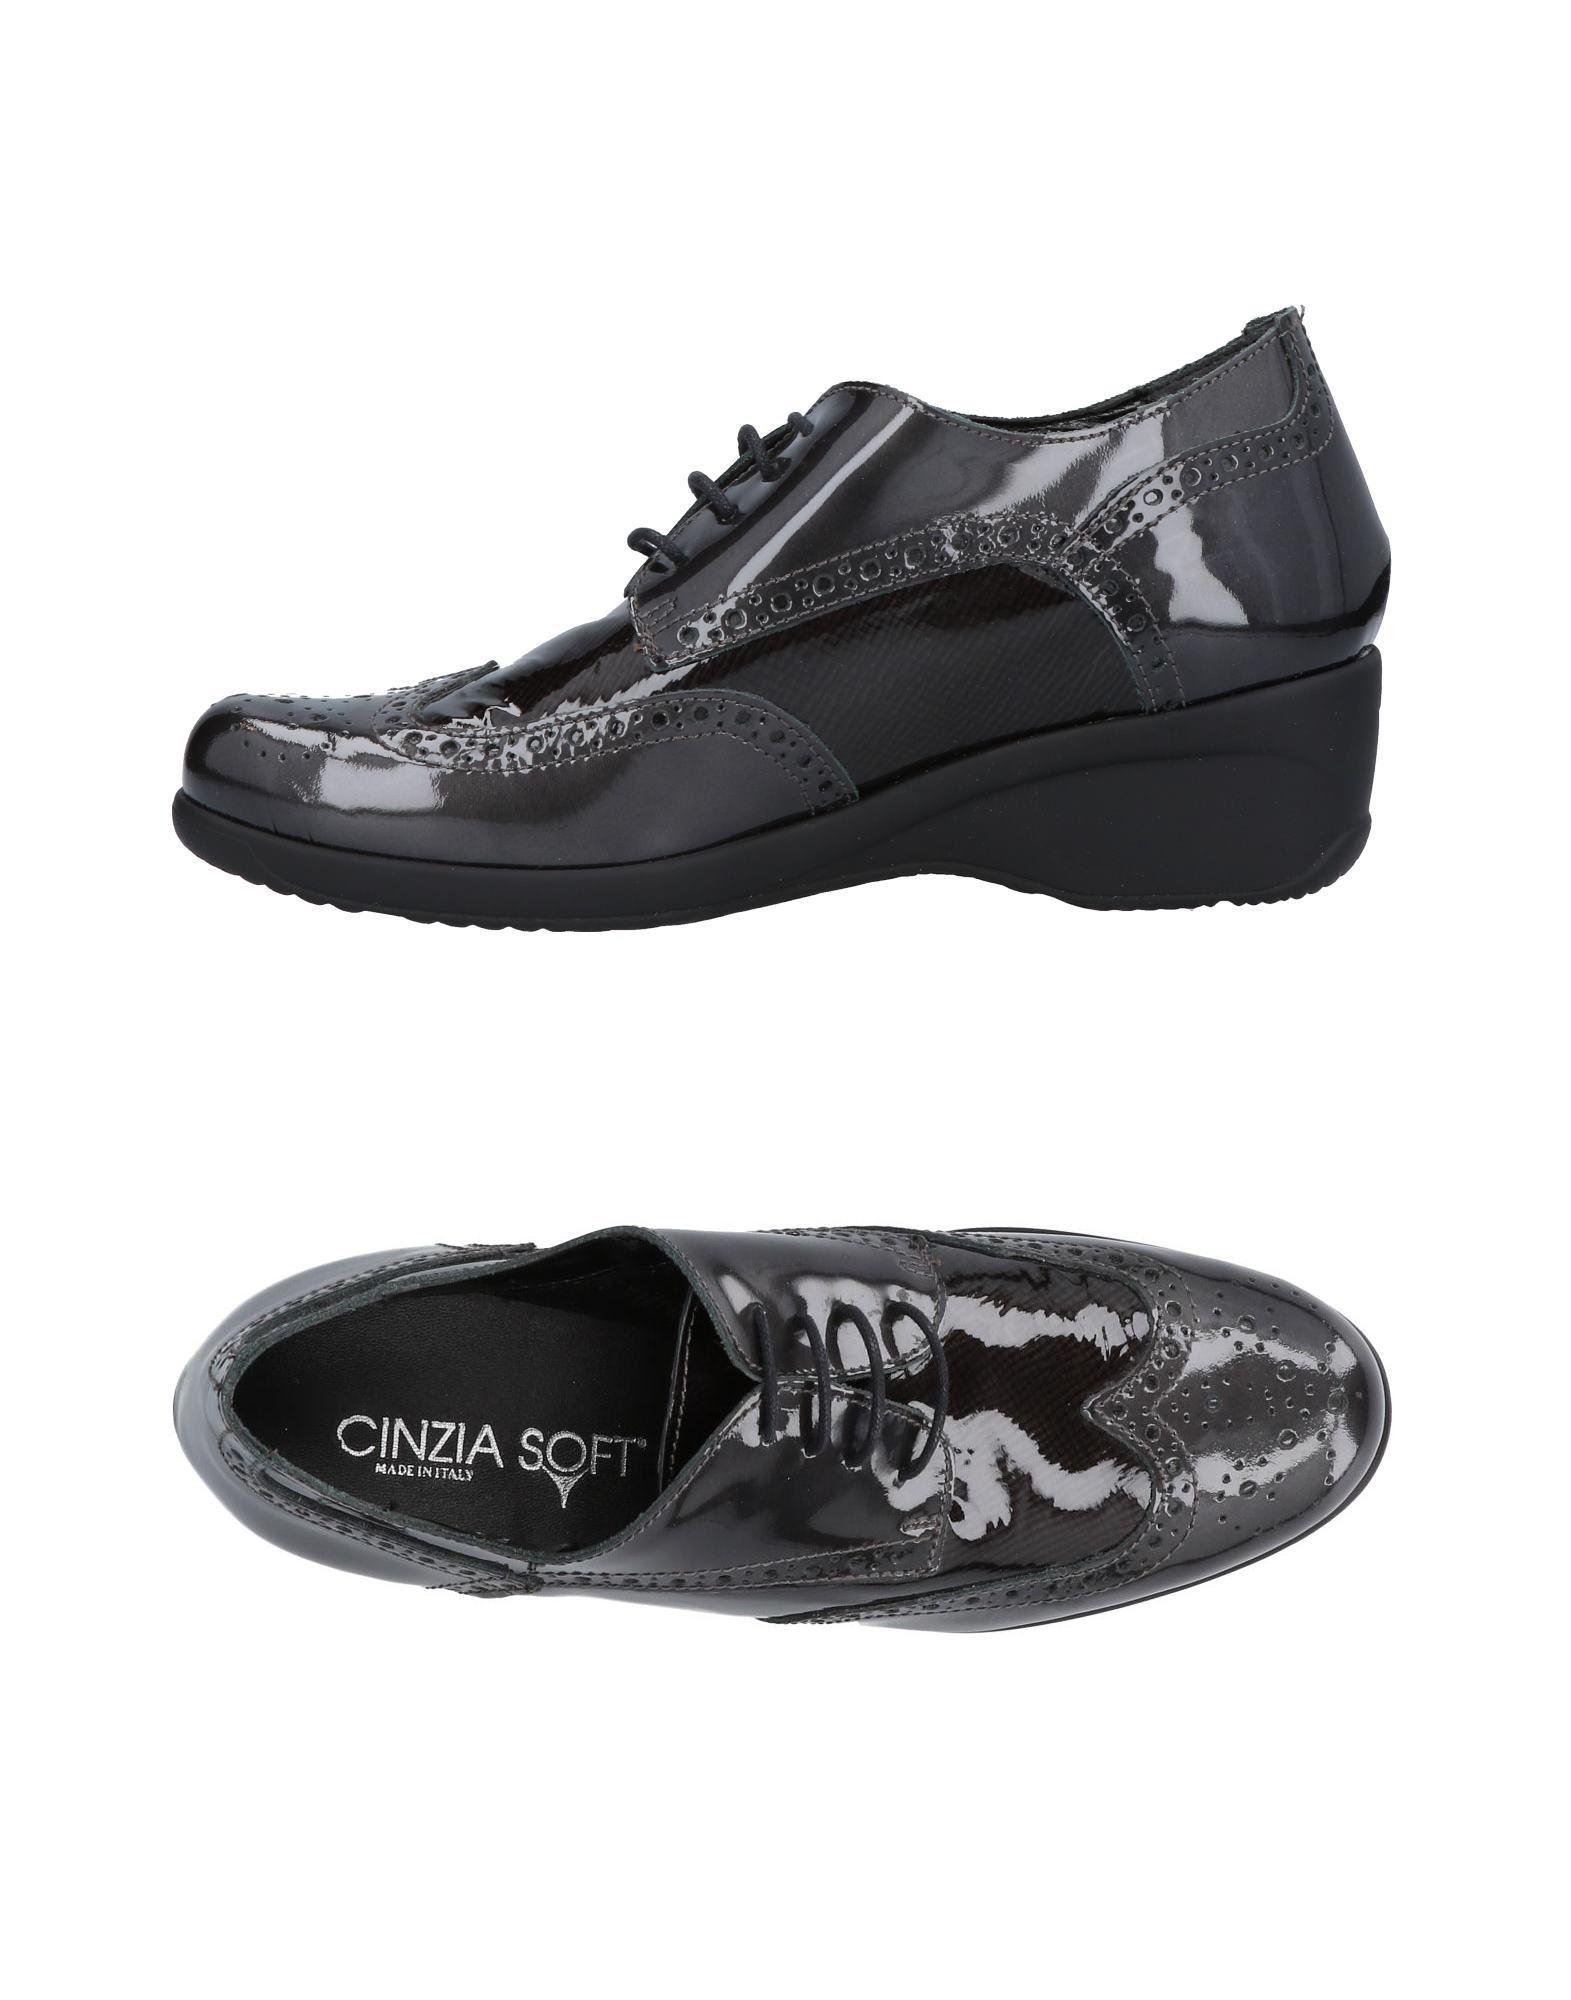 CINZIA SOFT by MAURI MODA Обувь на шнурках цены онлайн